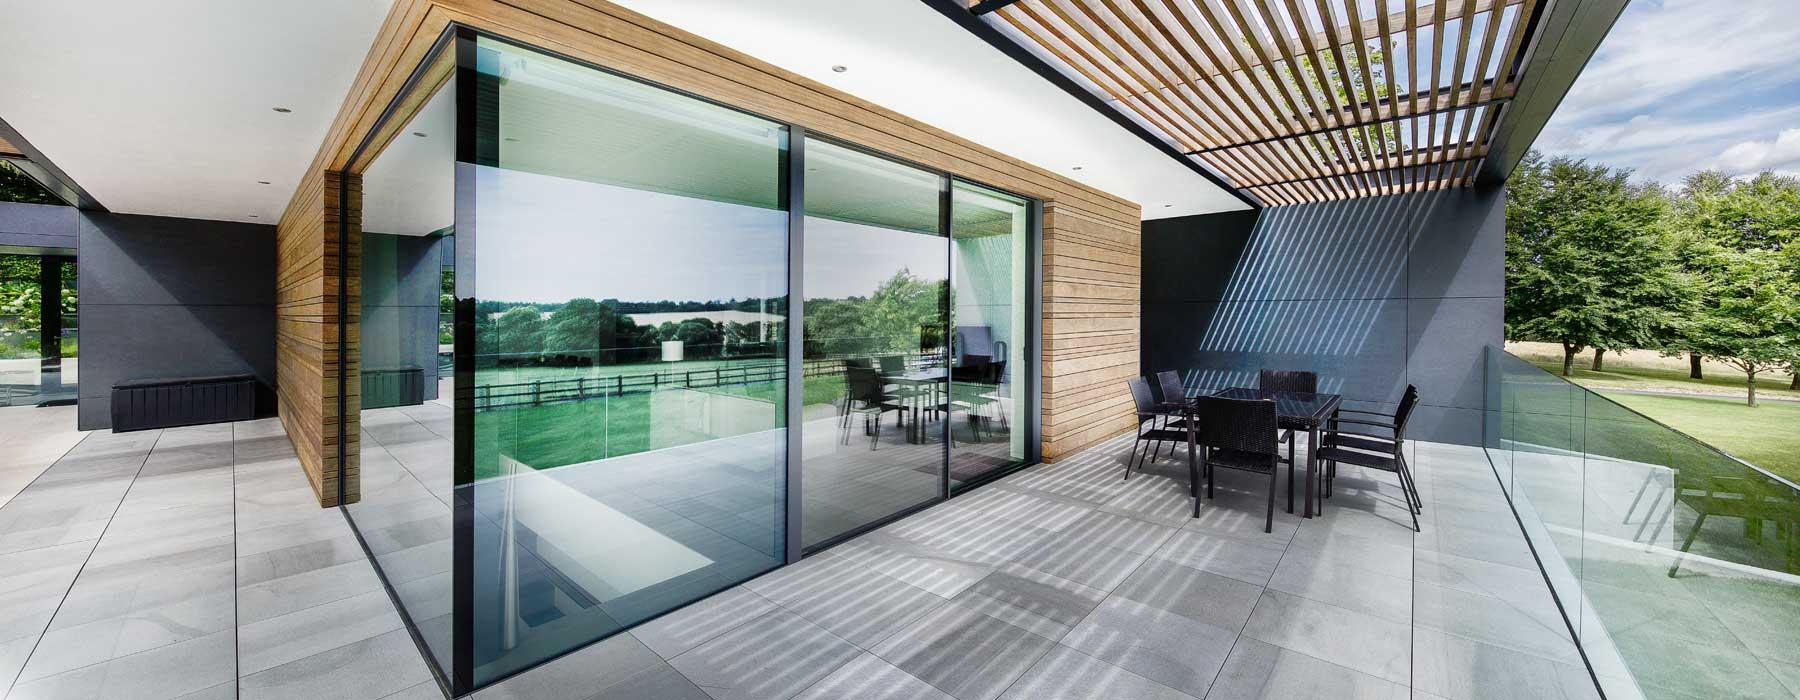 london minimal frame sliding doors